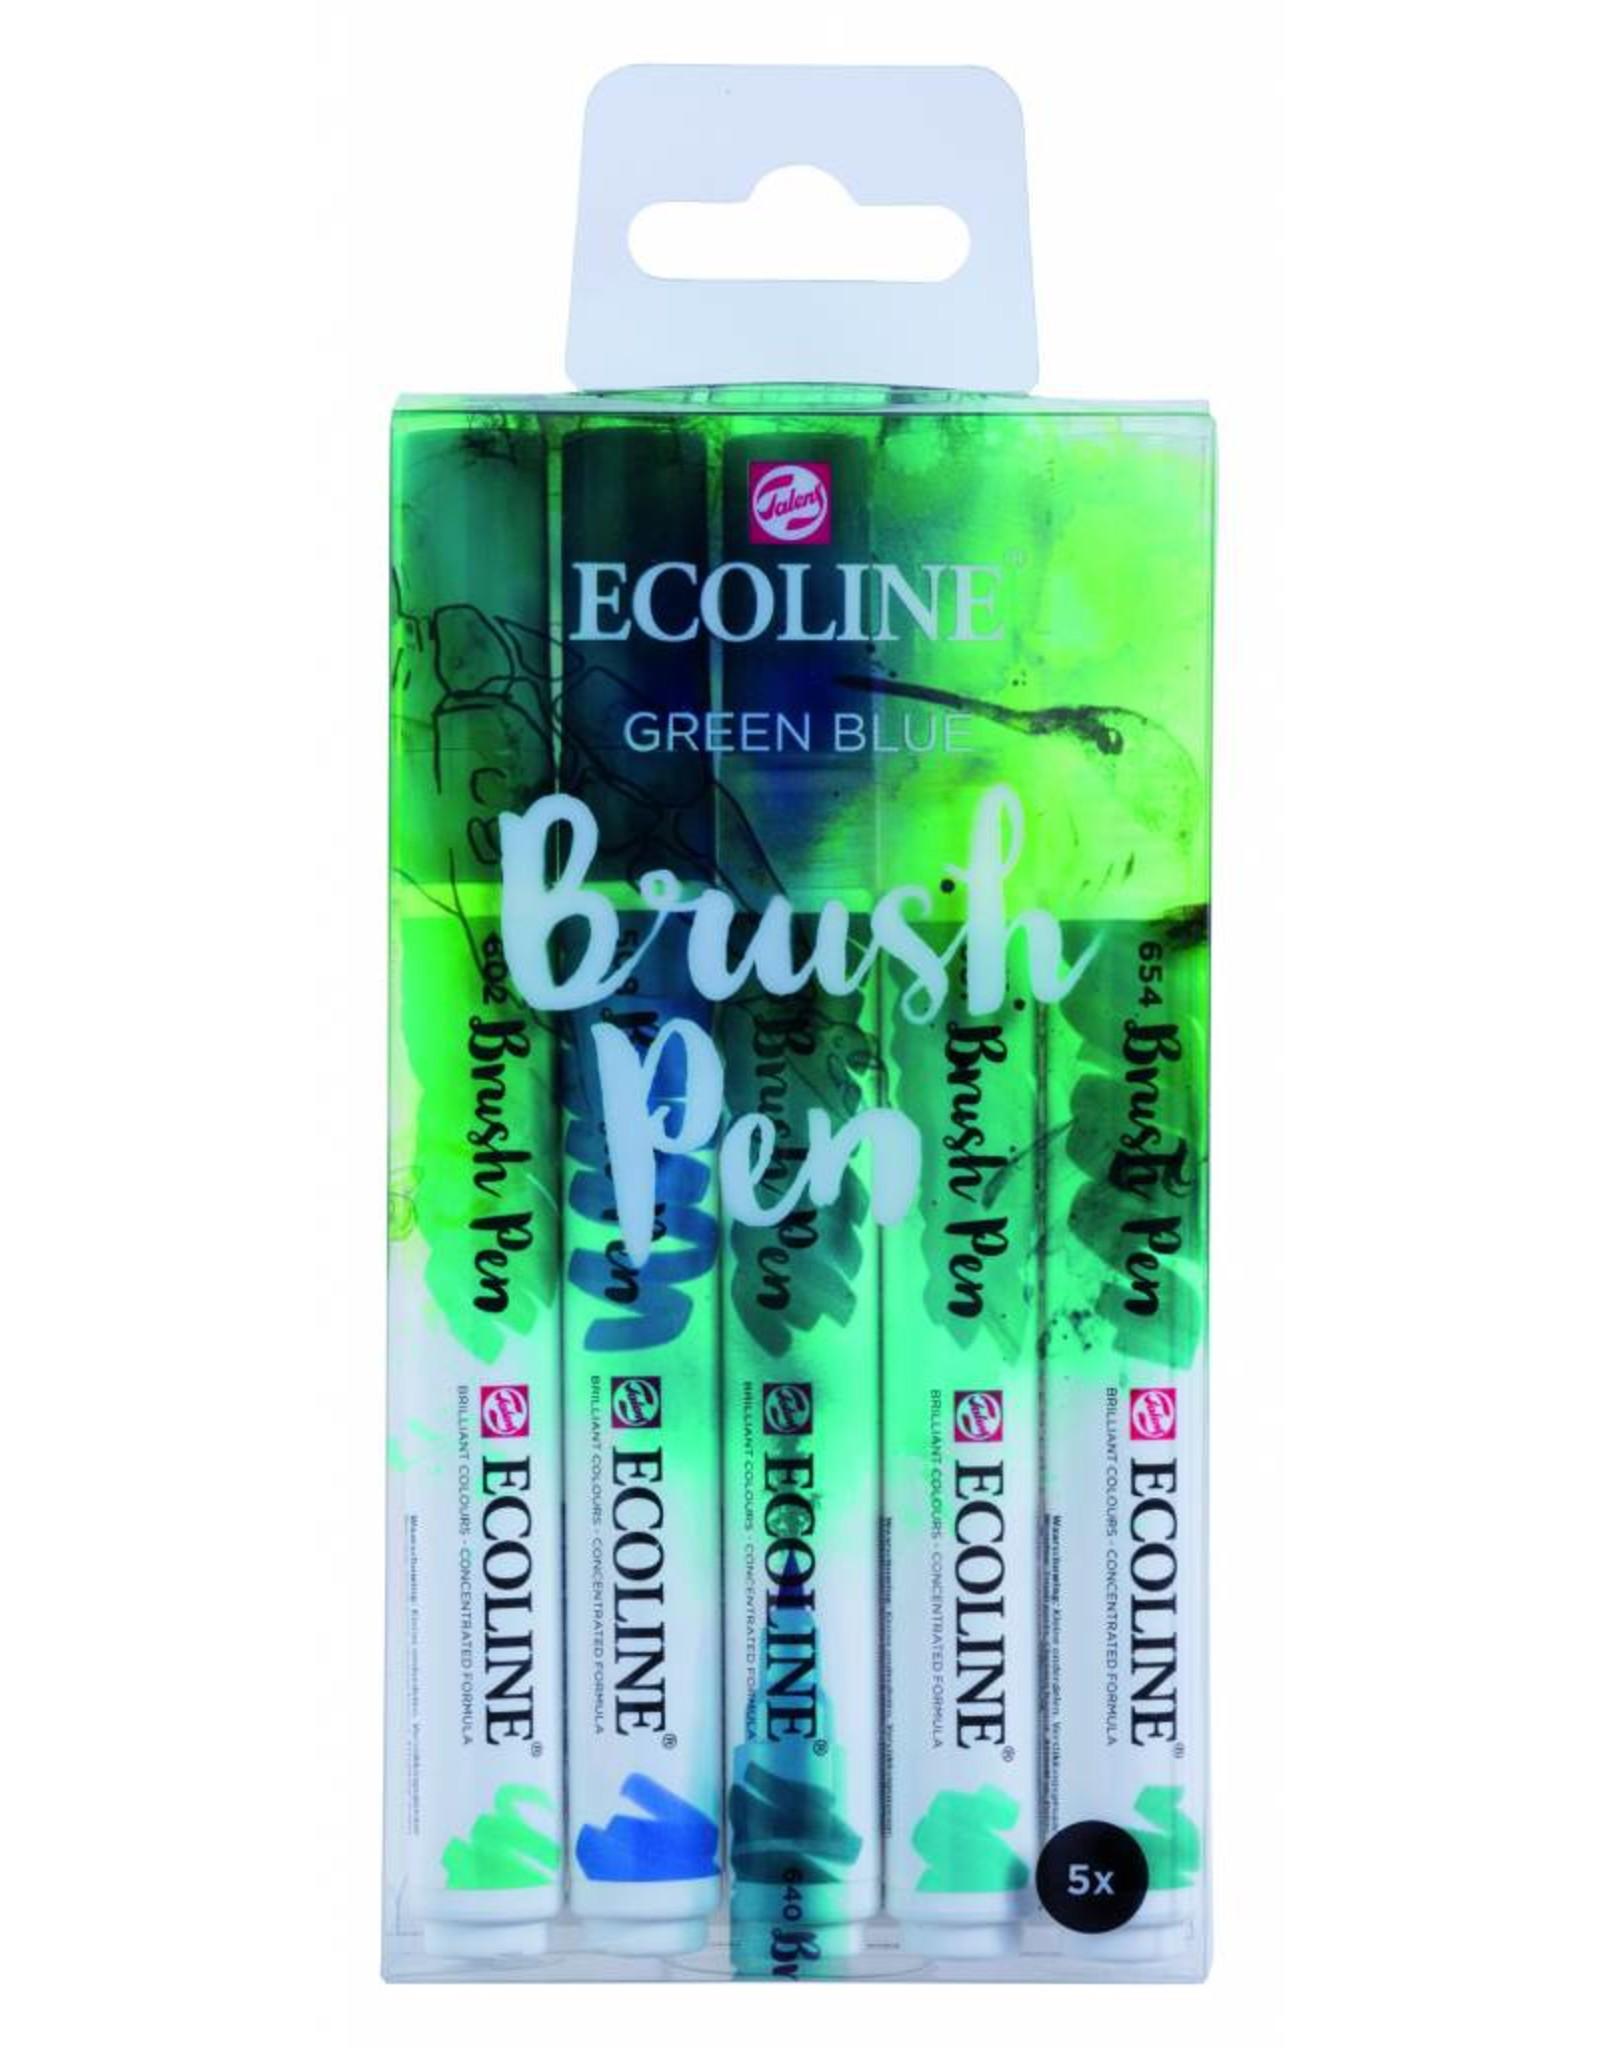 Ecoline brushpen set groen blauw